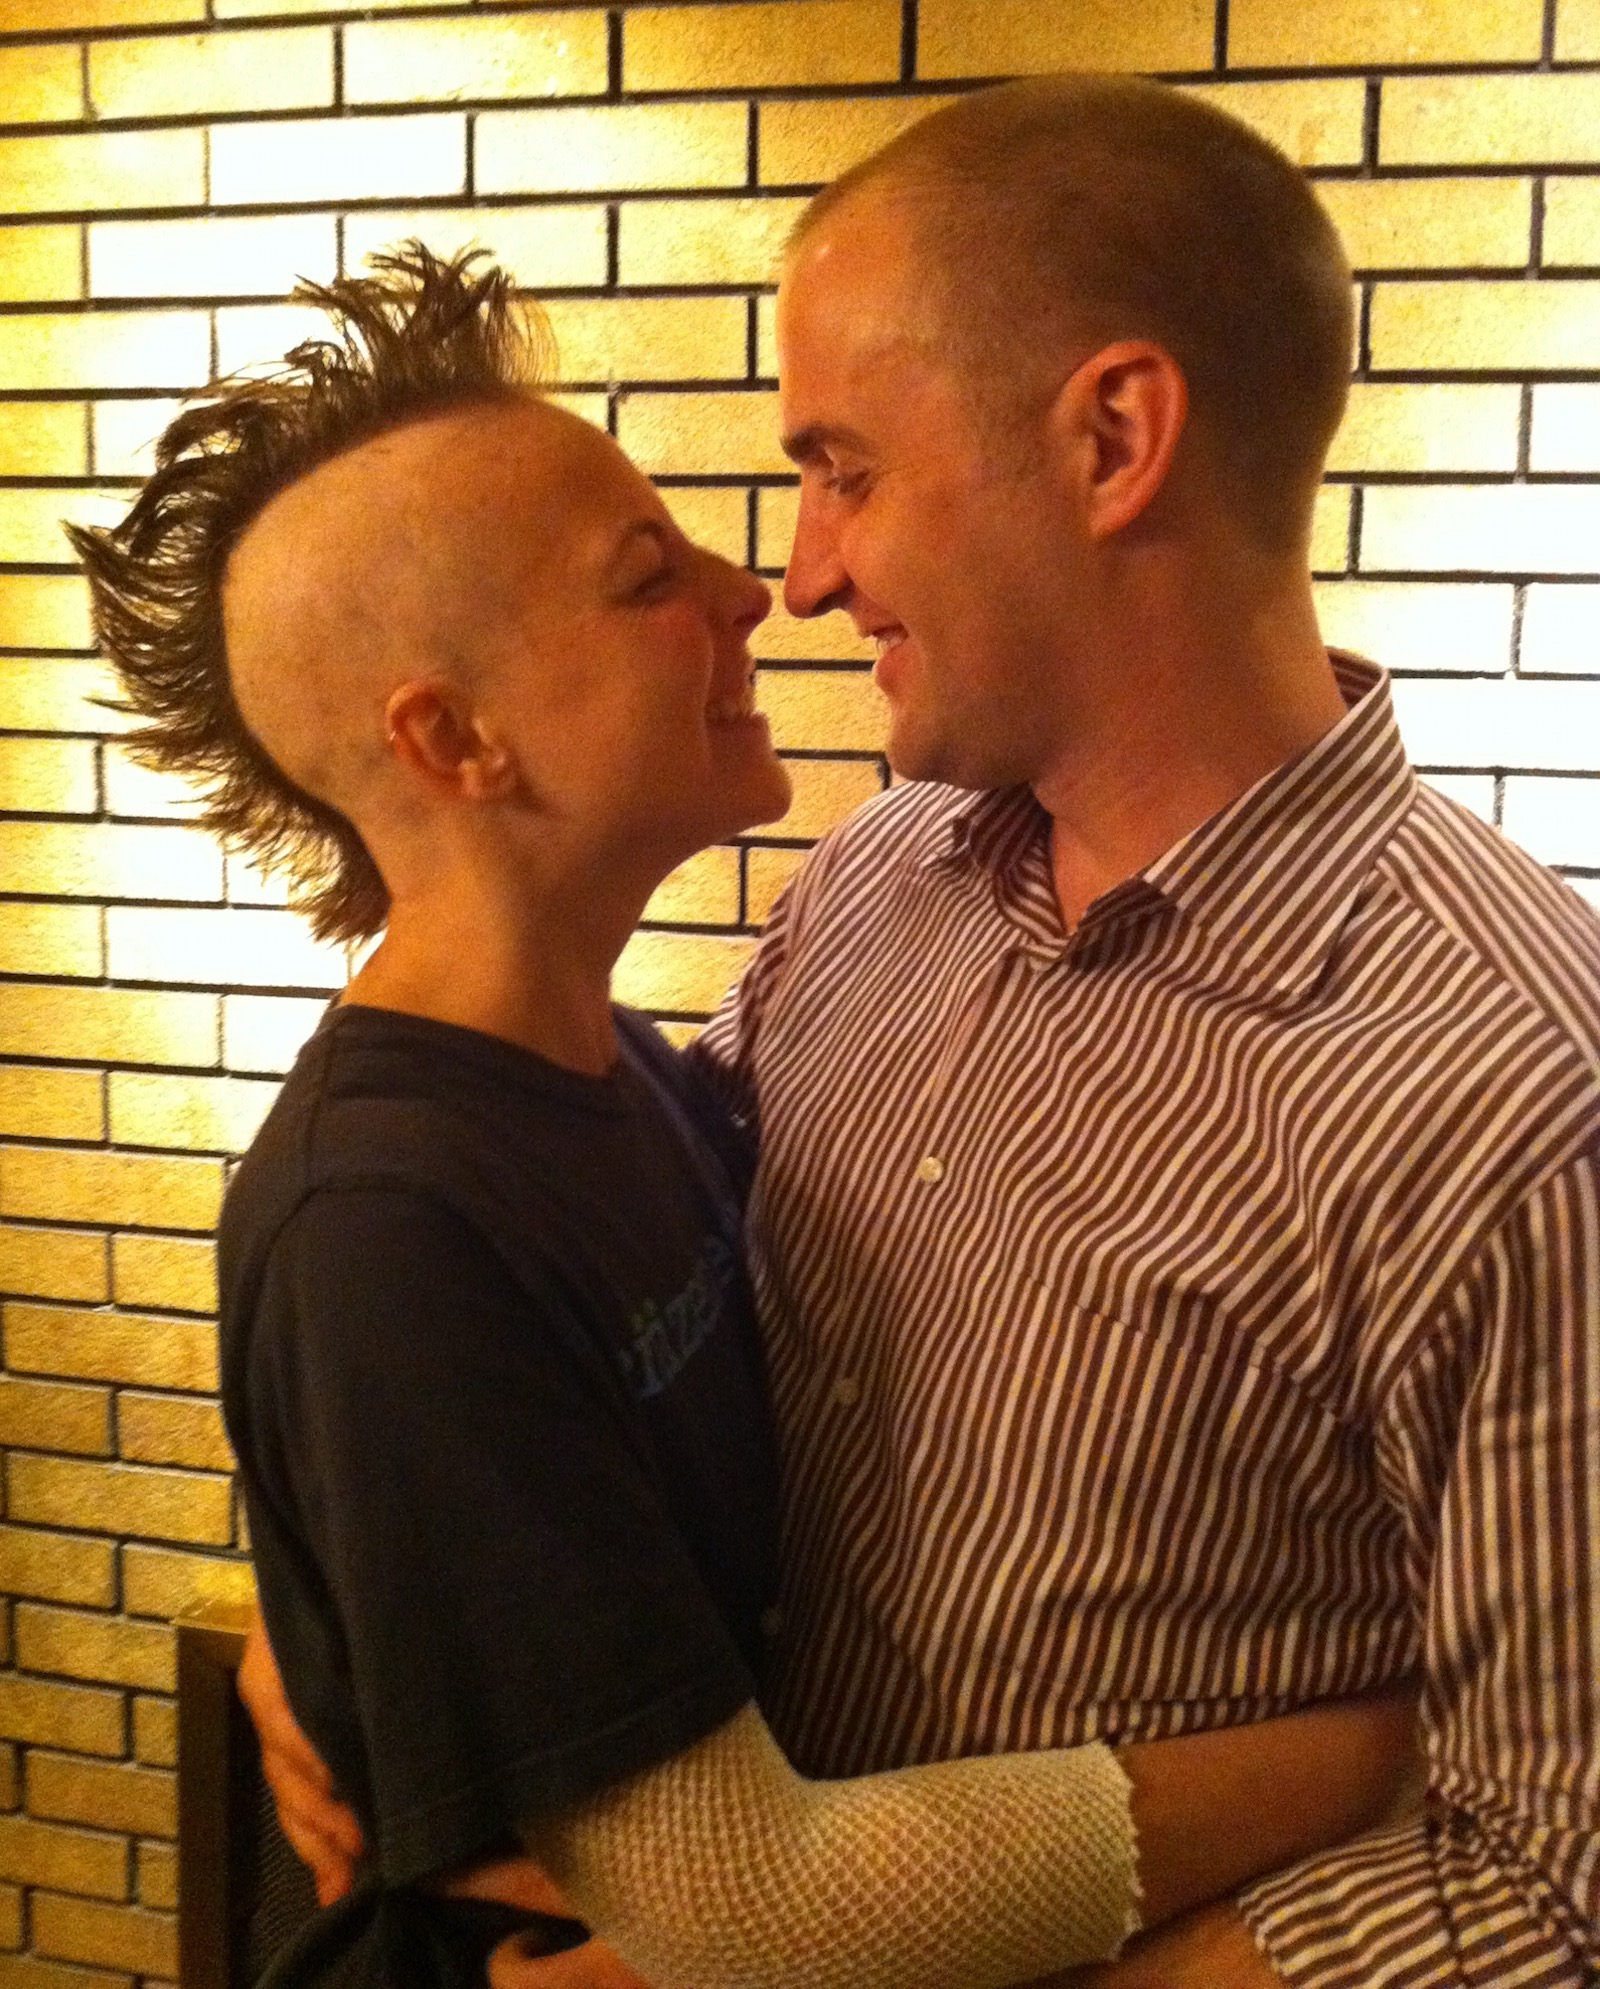 Becoming Bald